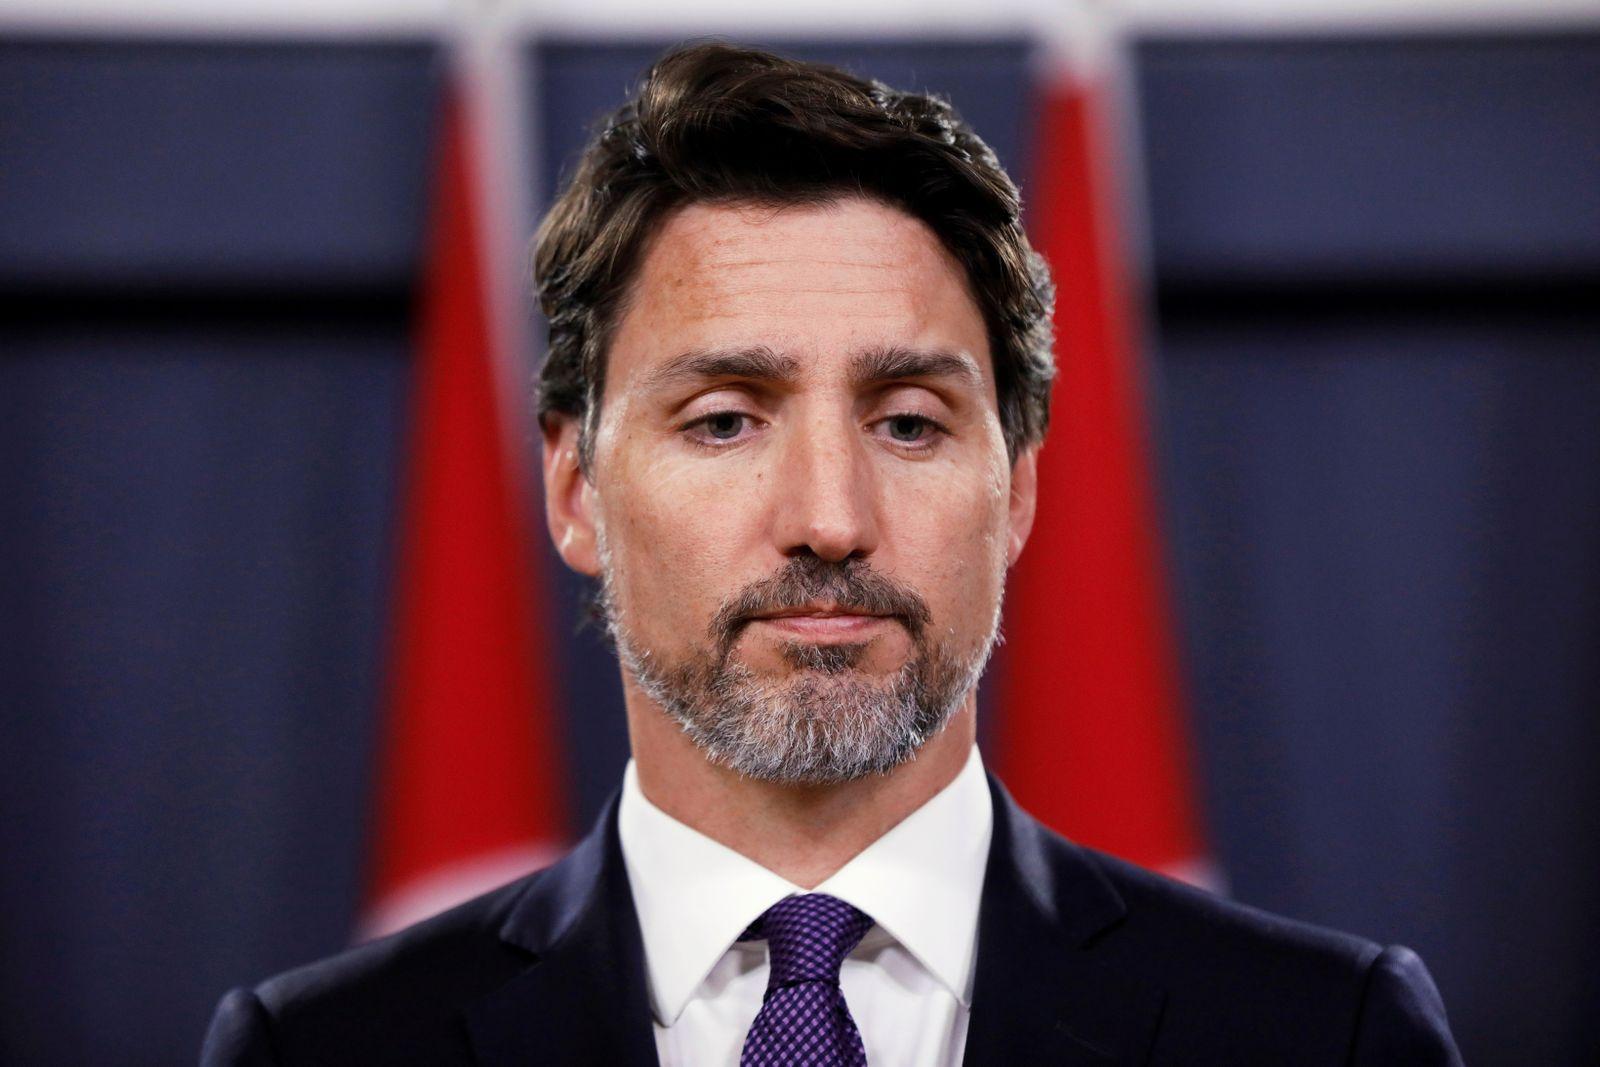 Canada's PM Trudeau attends a news conference in Ottawa